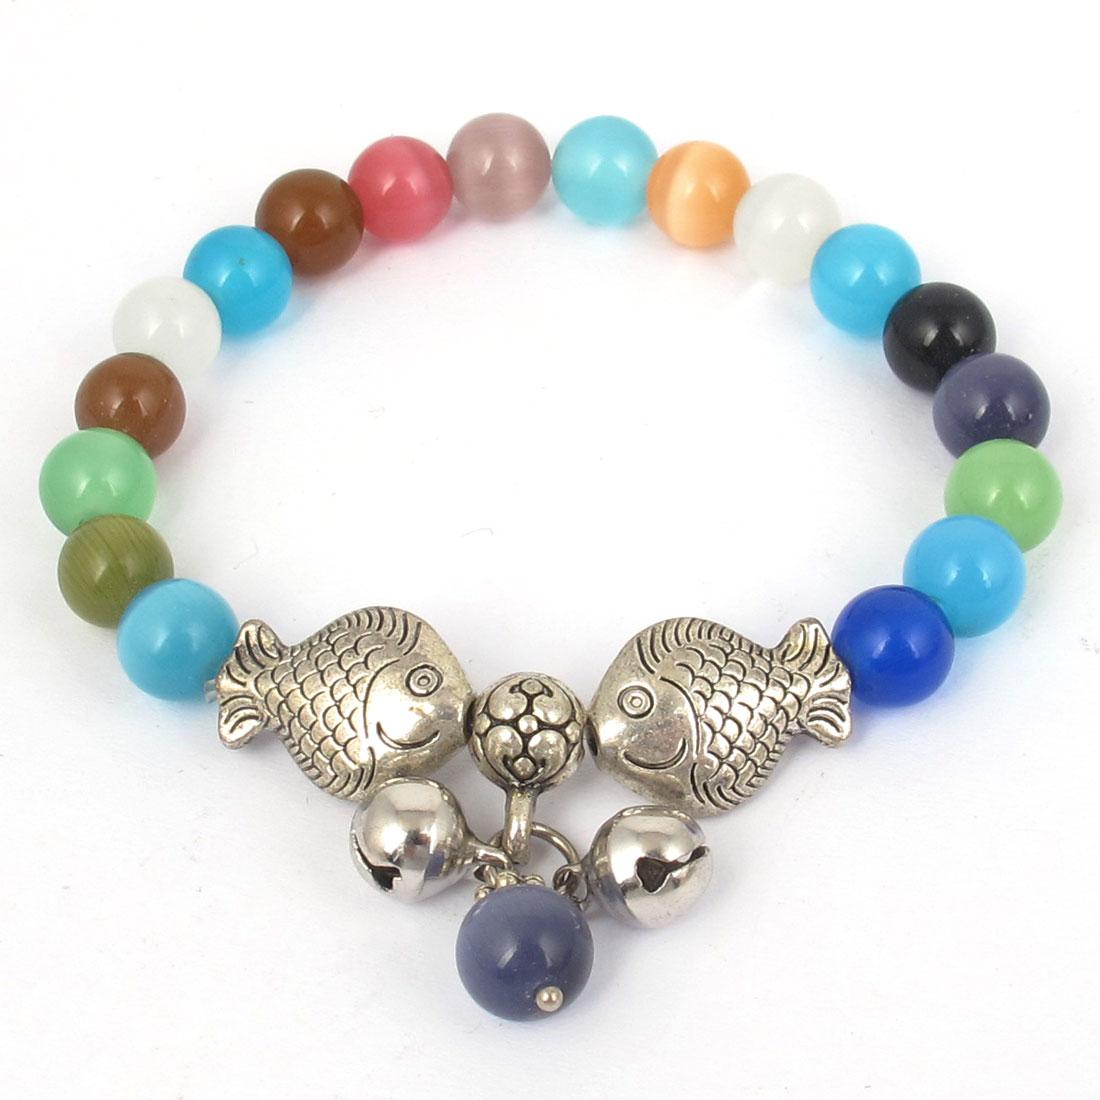 Fish Detailing Round Opal Bead Wrist Decor Bangle Bracelet Multicolor for Lady